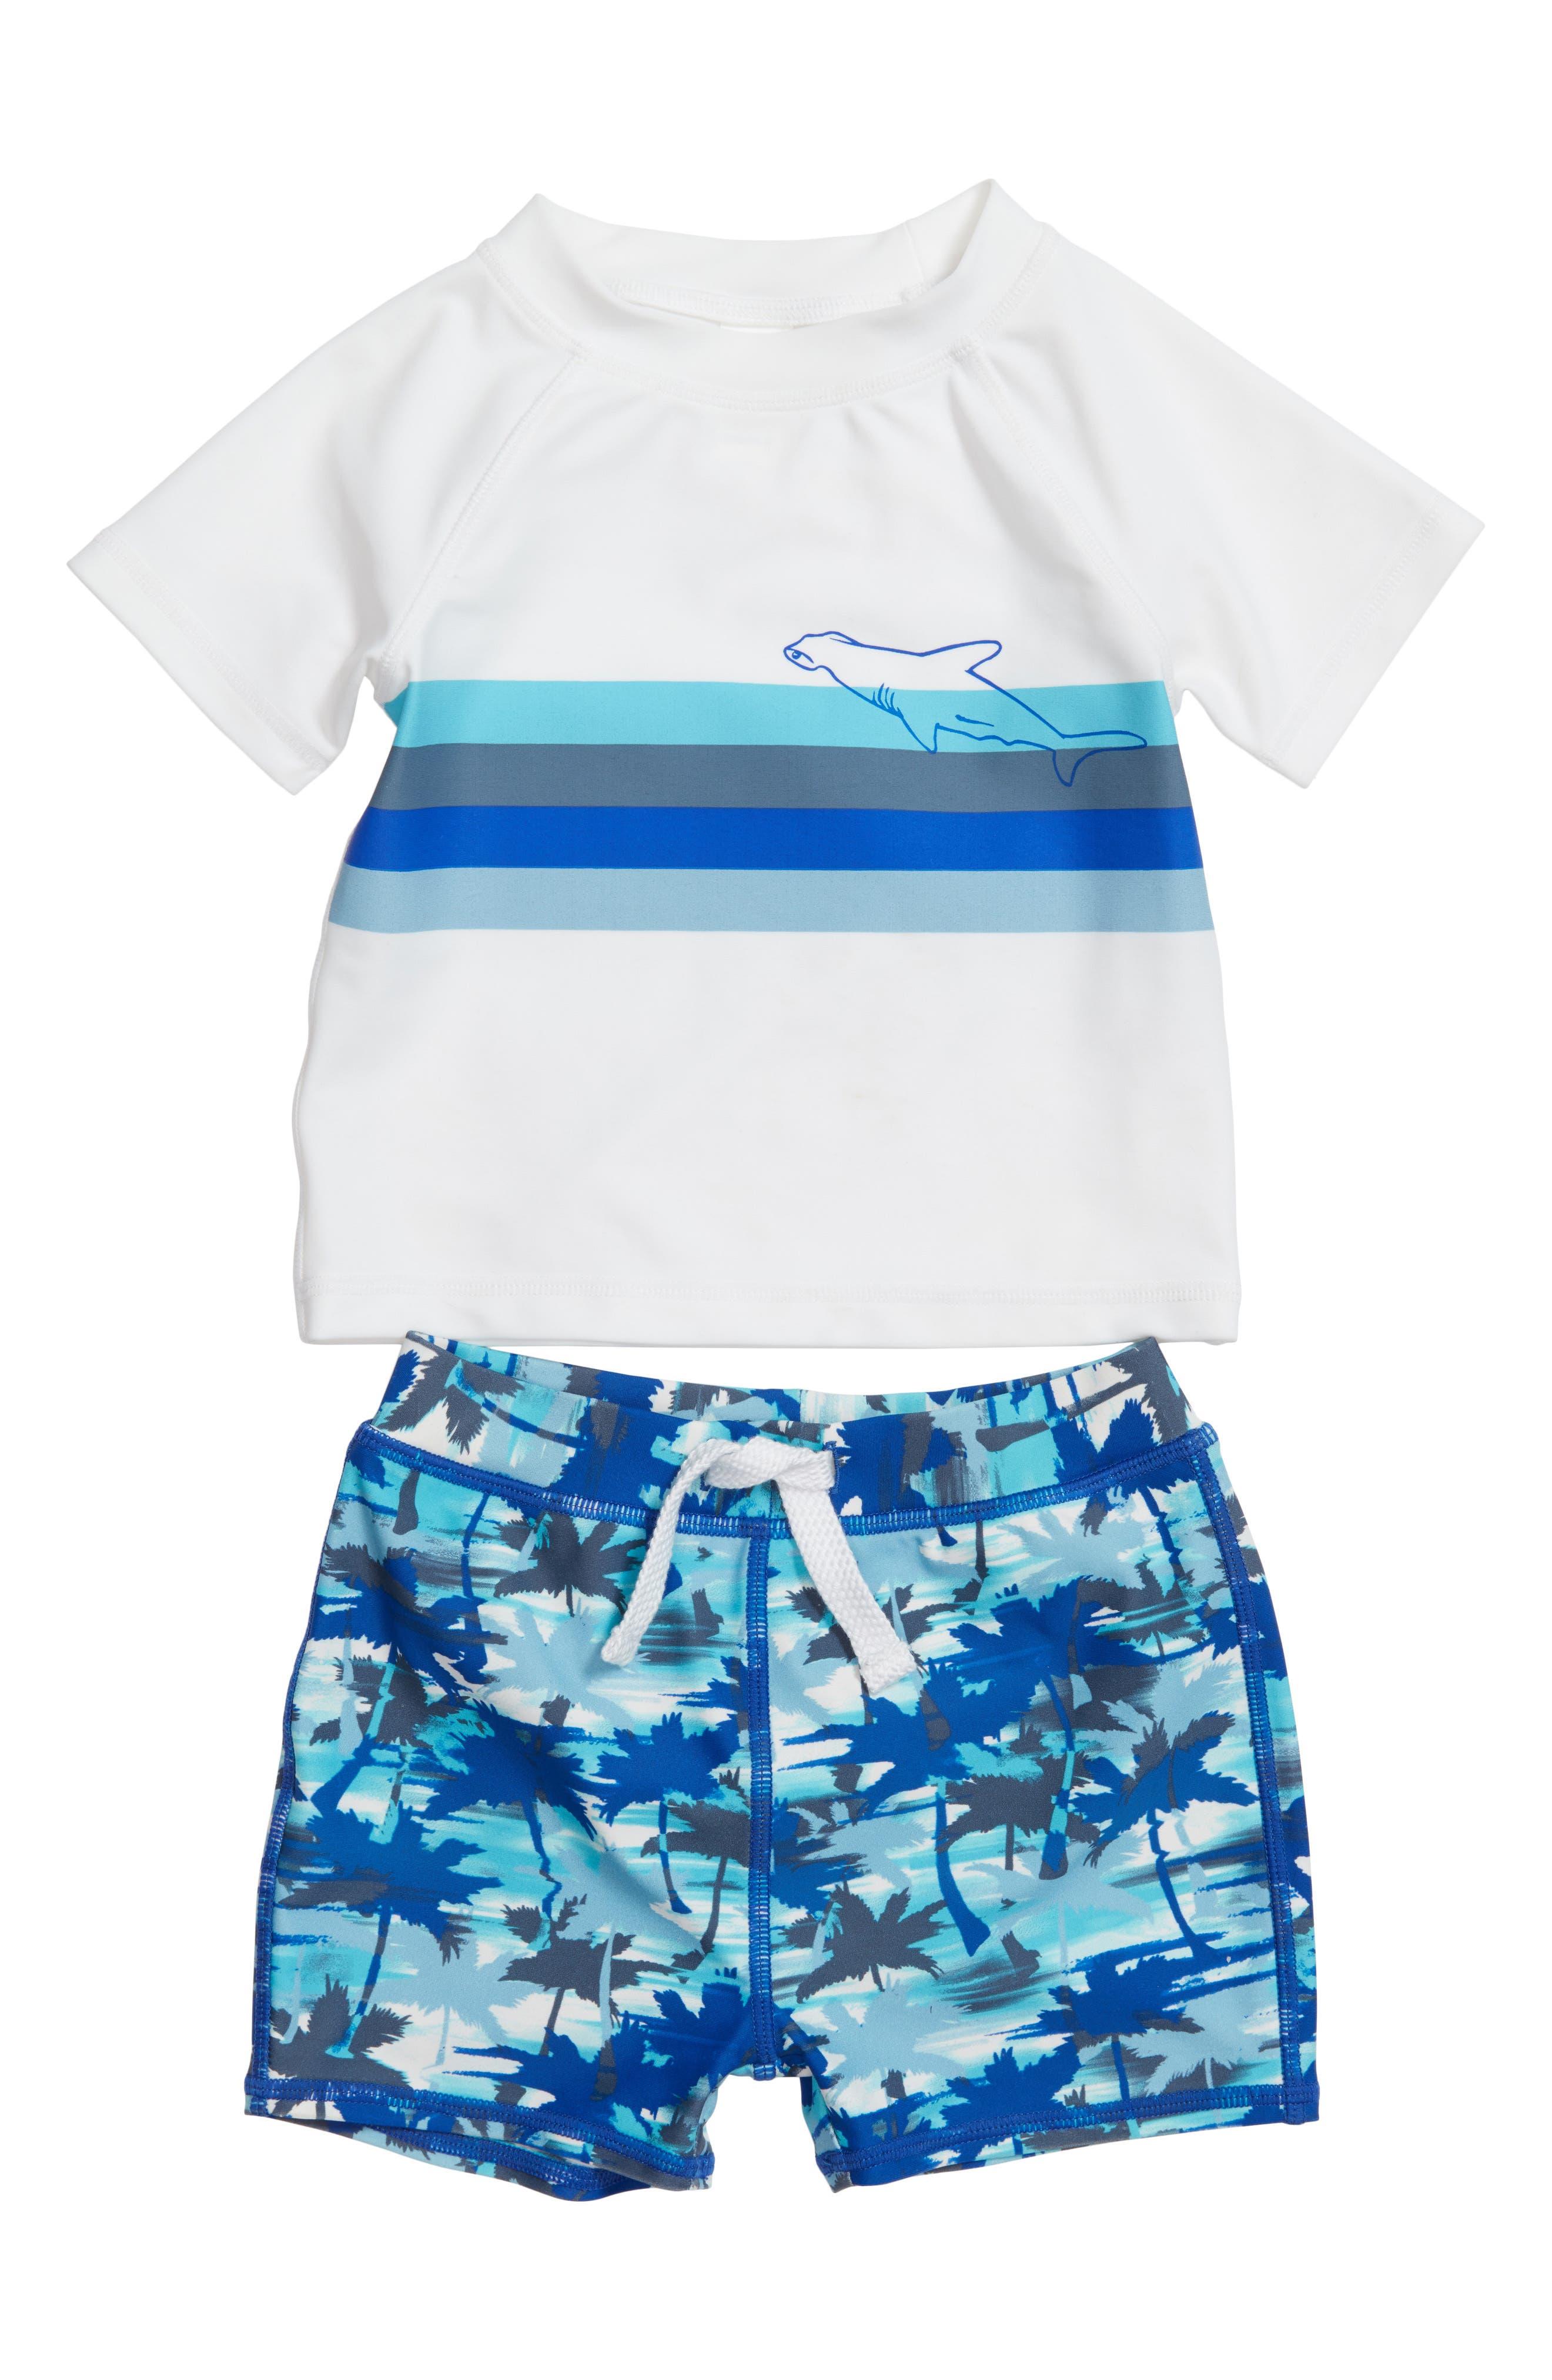 Two-Piece Rashguard Swimsuit,                         Main,                         color, White- Blue Palm Haze